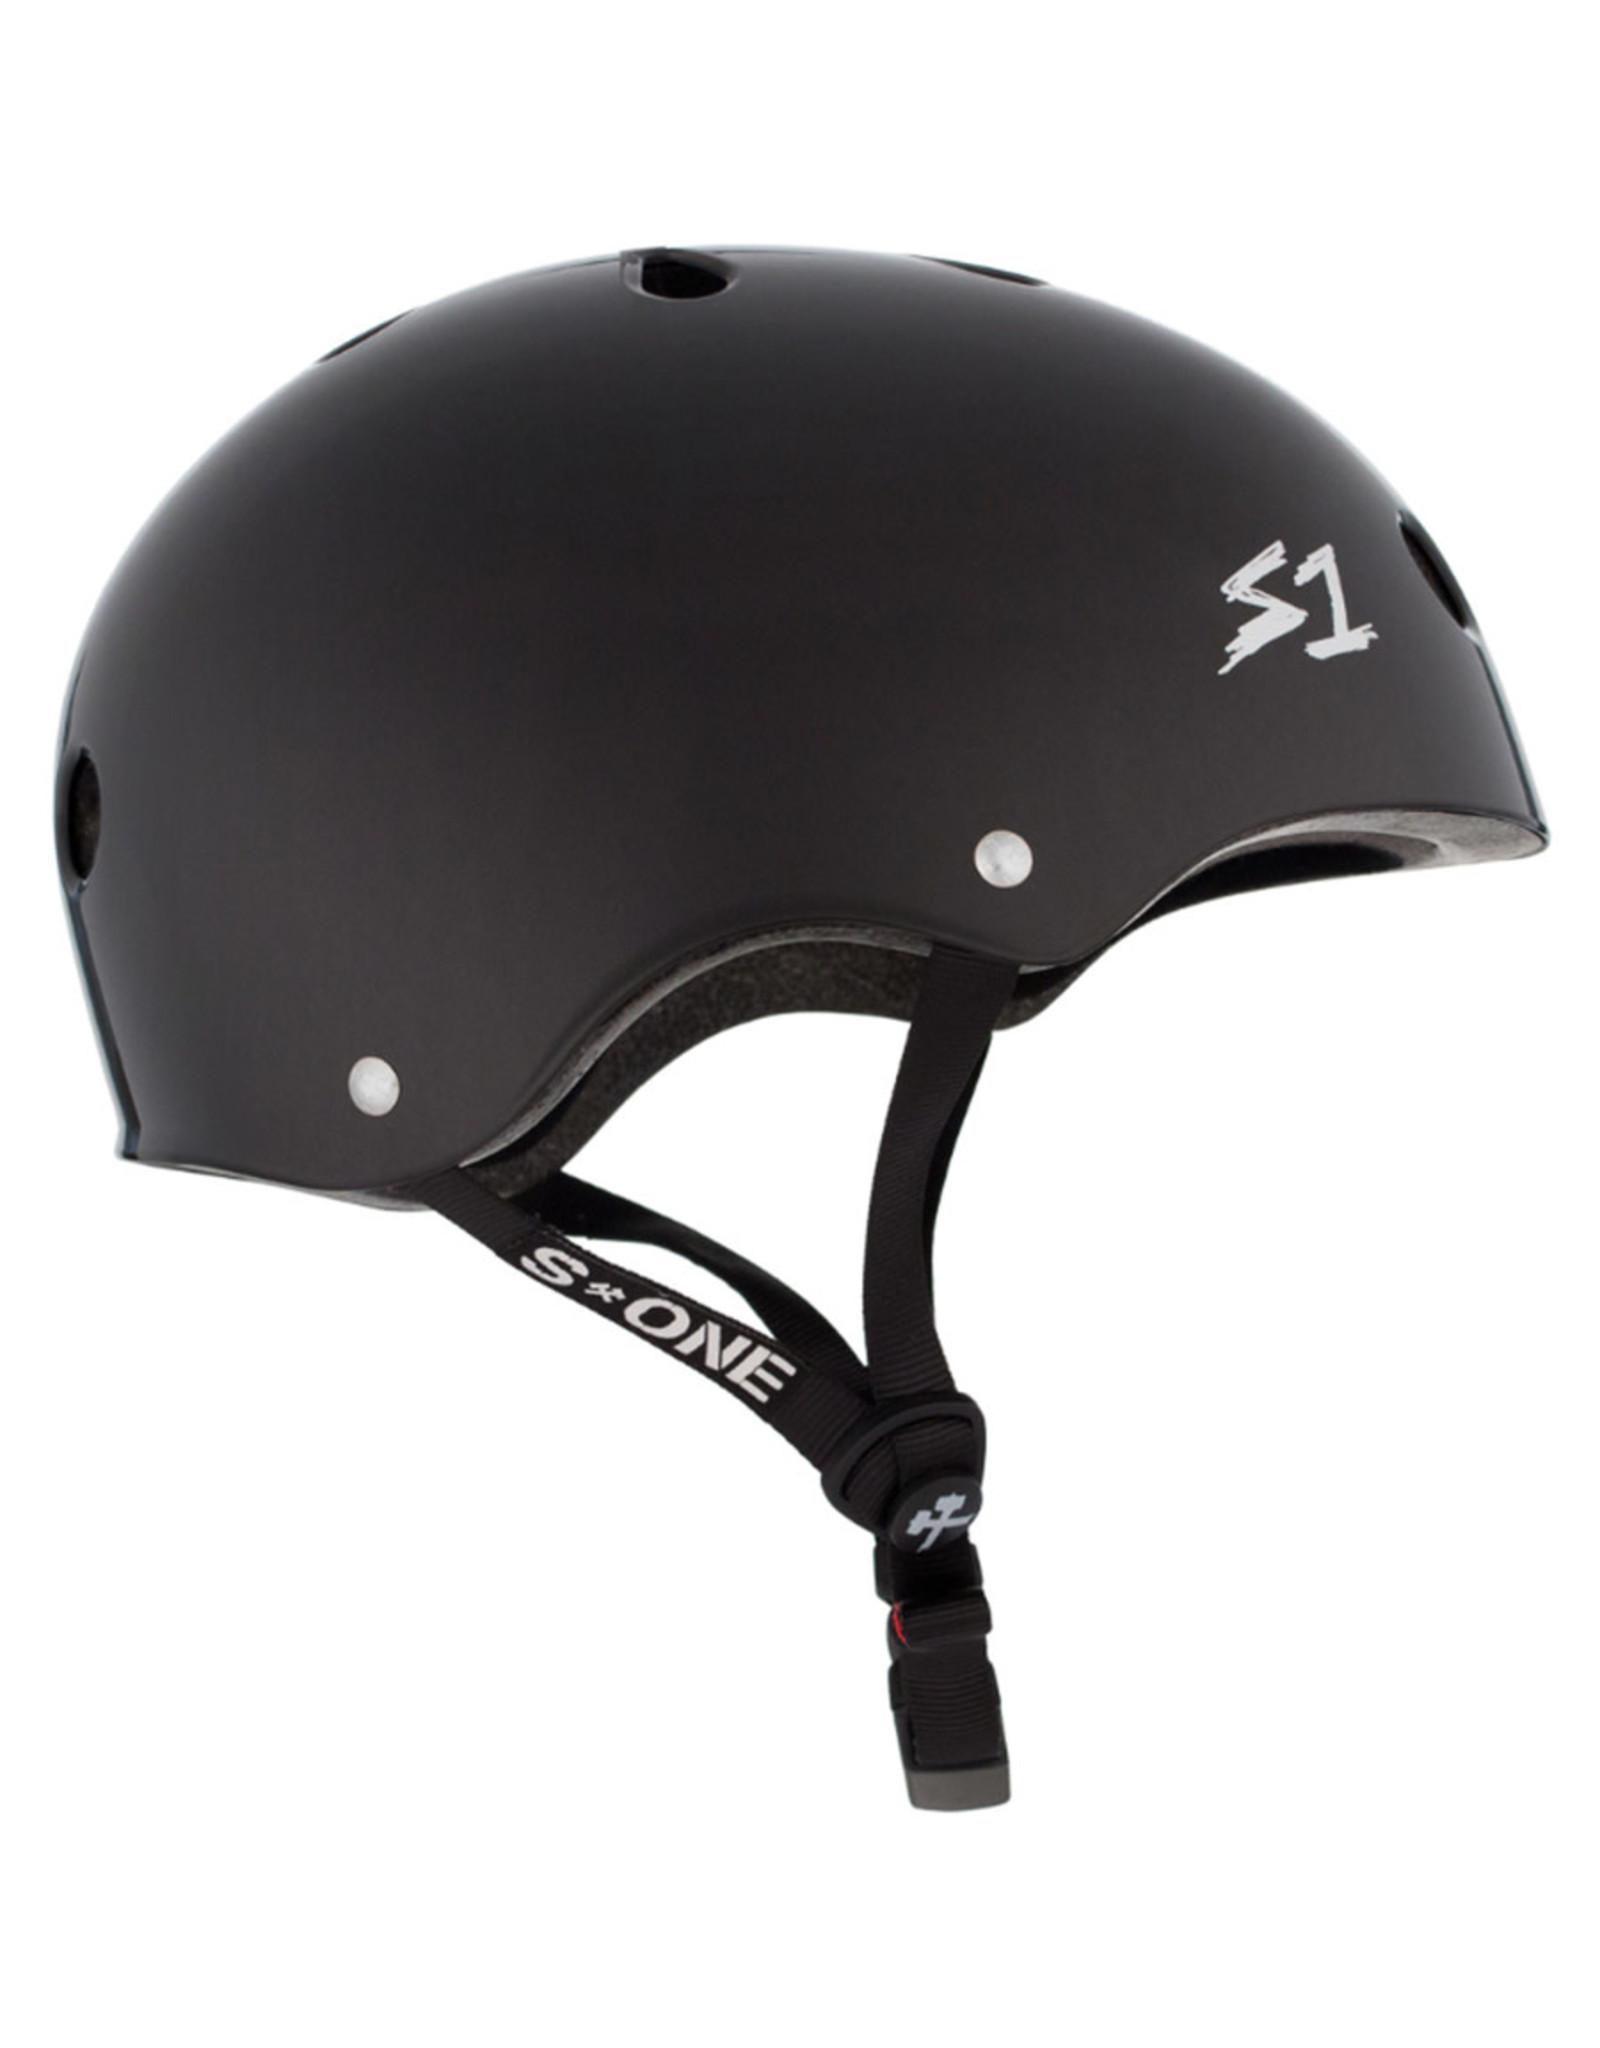 S-One S-One Helmet The Mega (Black Matte/Black Straps)